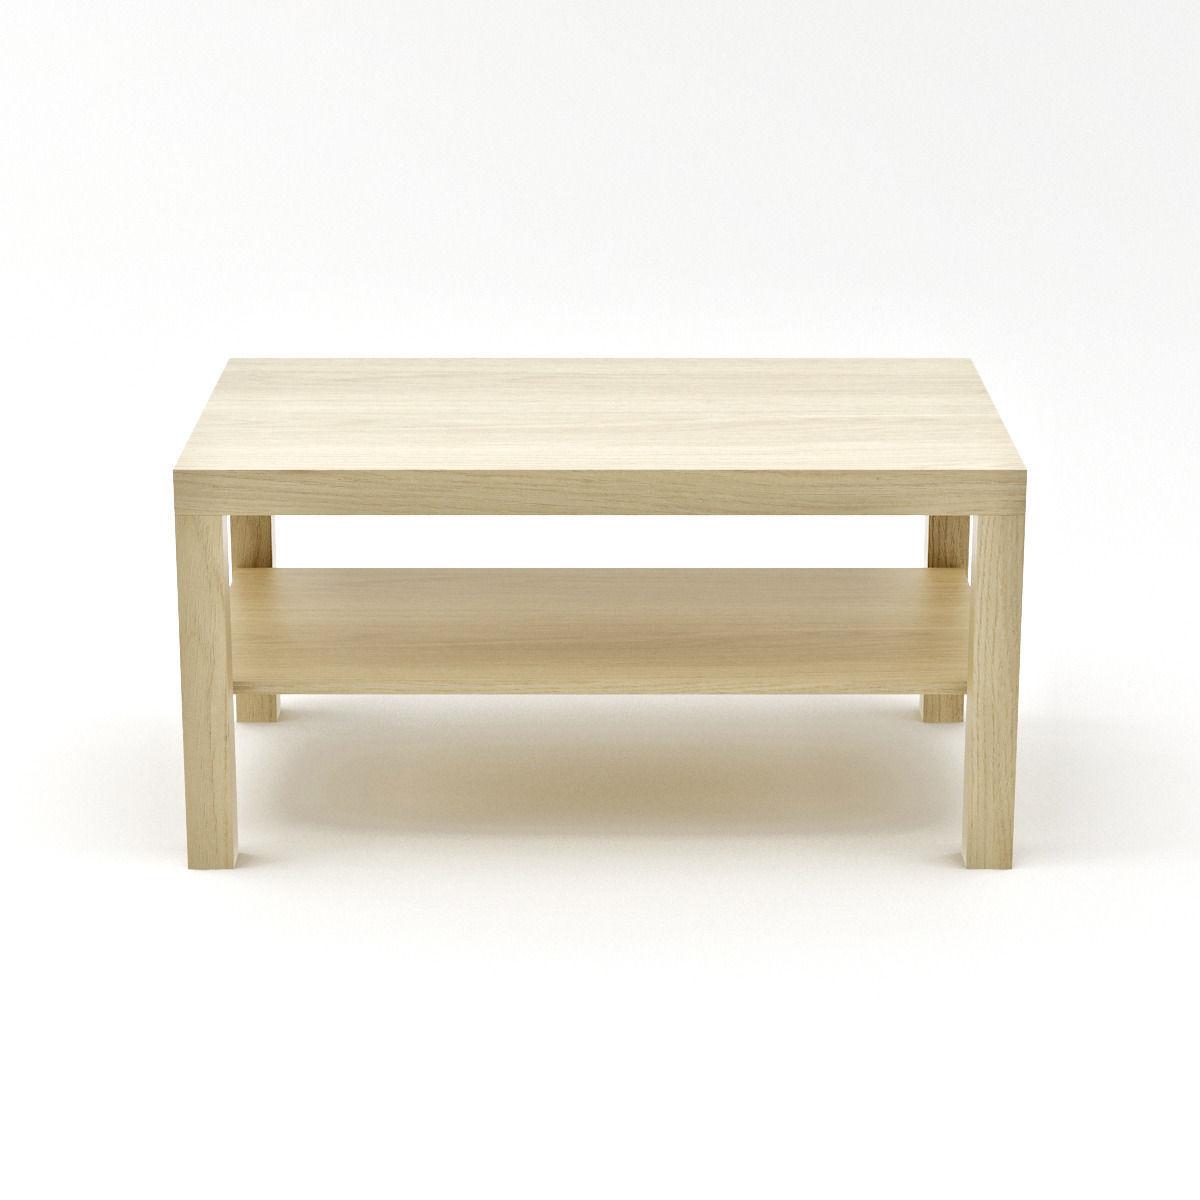 Ikea Lack Side Table Large 3d Model Max